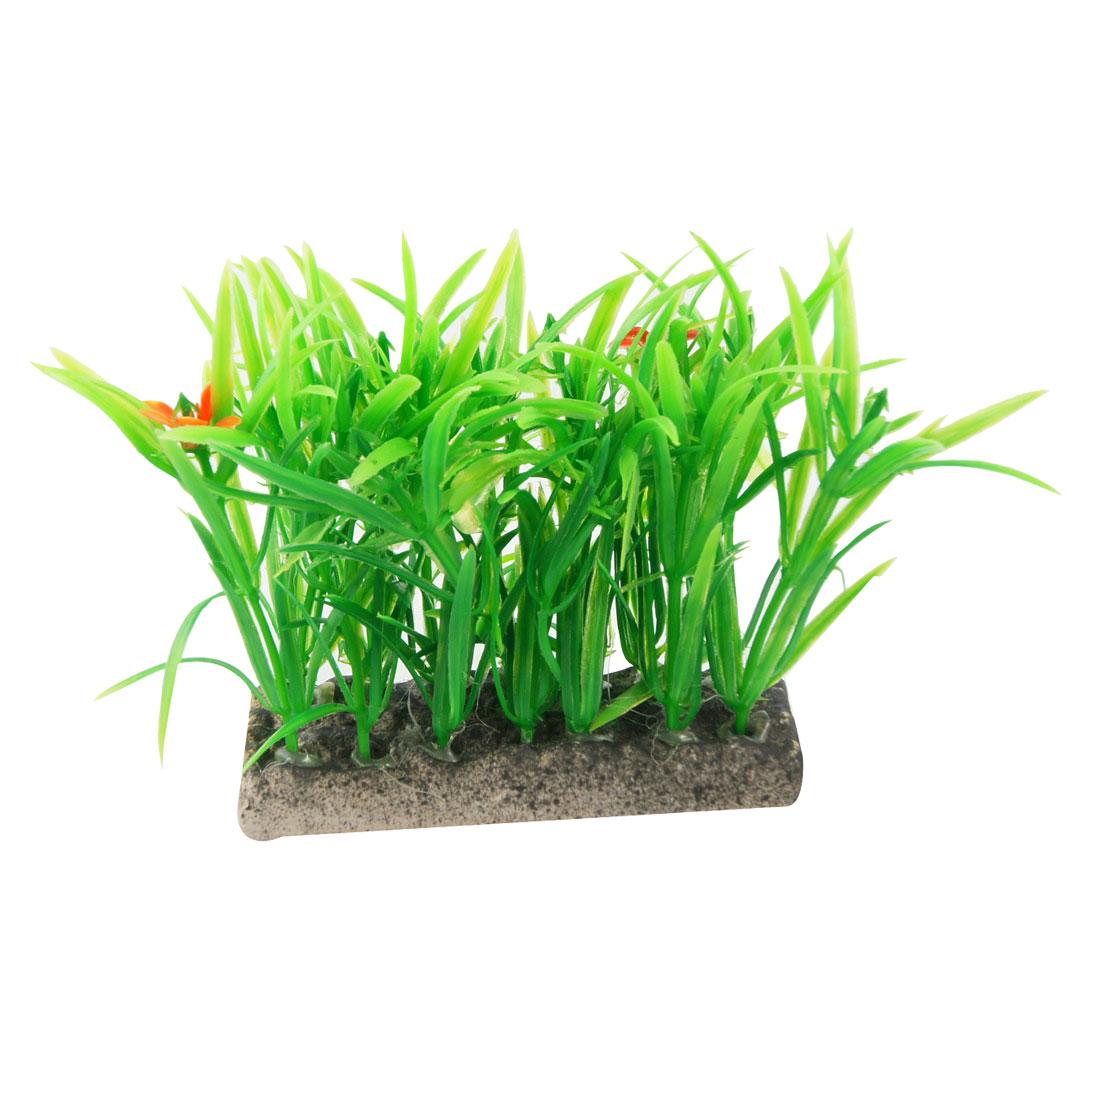 "3.5"" Height Artificial Aquatic Green Plant Decor for Fish Tank"